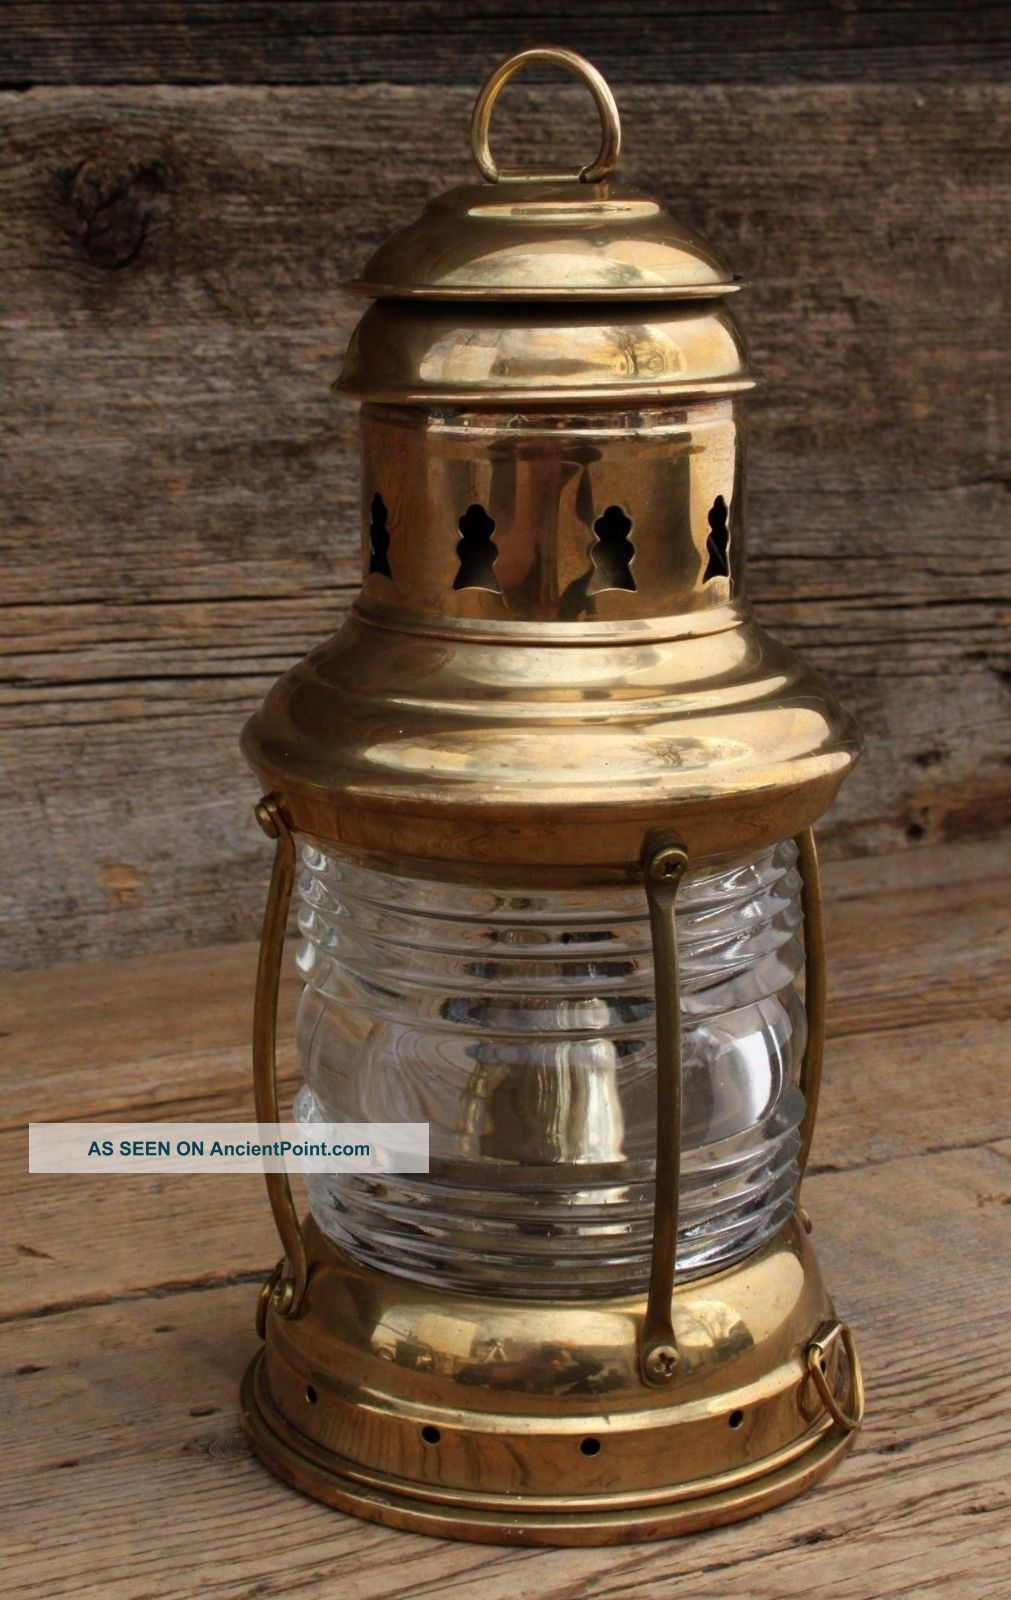 Vintage Perko Brass Ships Lantern H - 6 - 71 Never Fired Lamps & Lighting photo